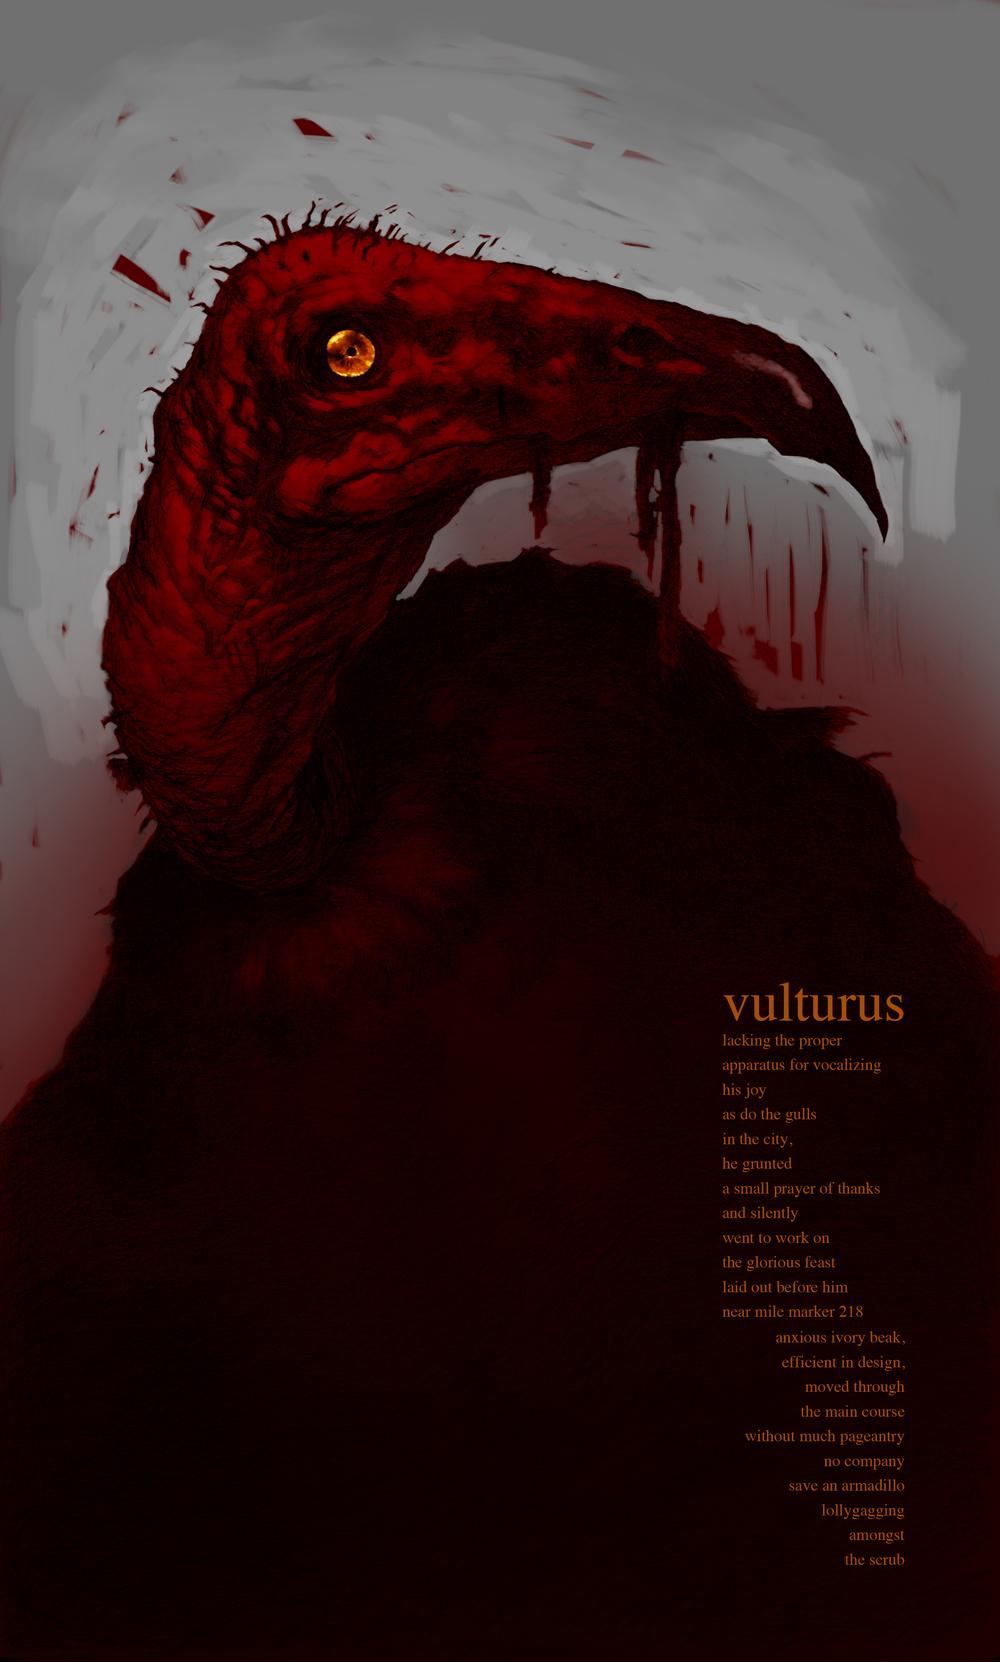 vulturus.jpg